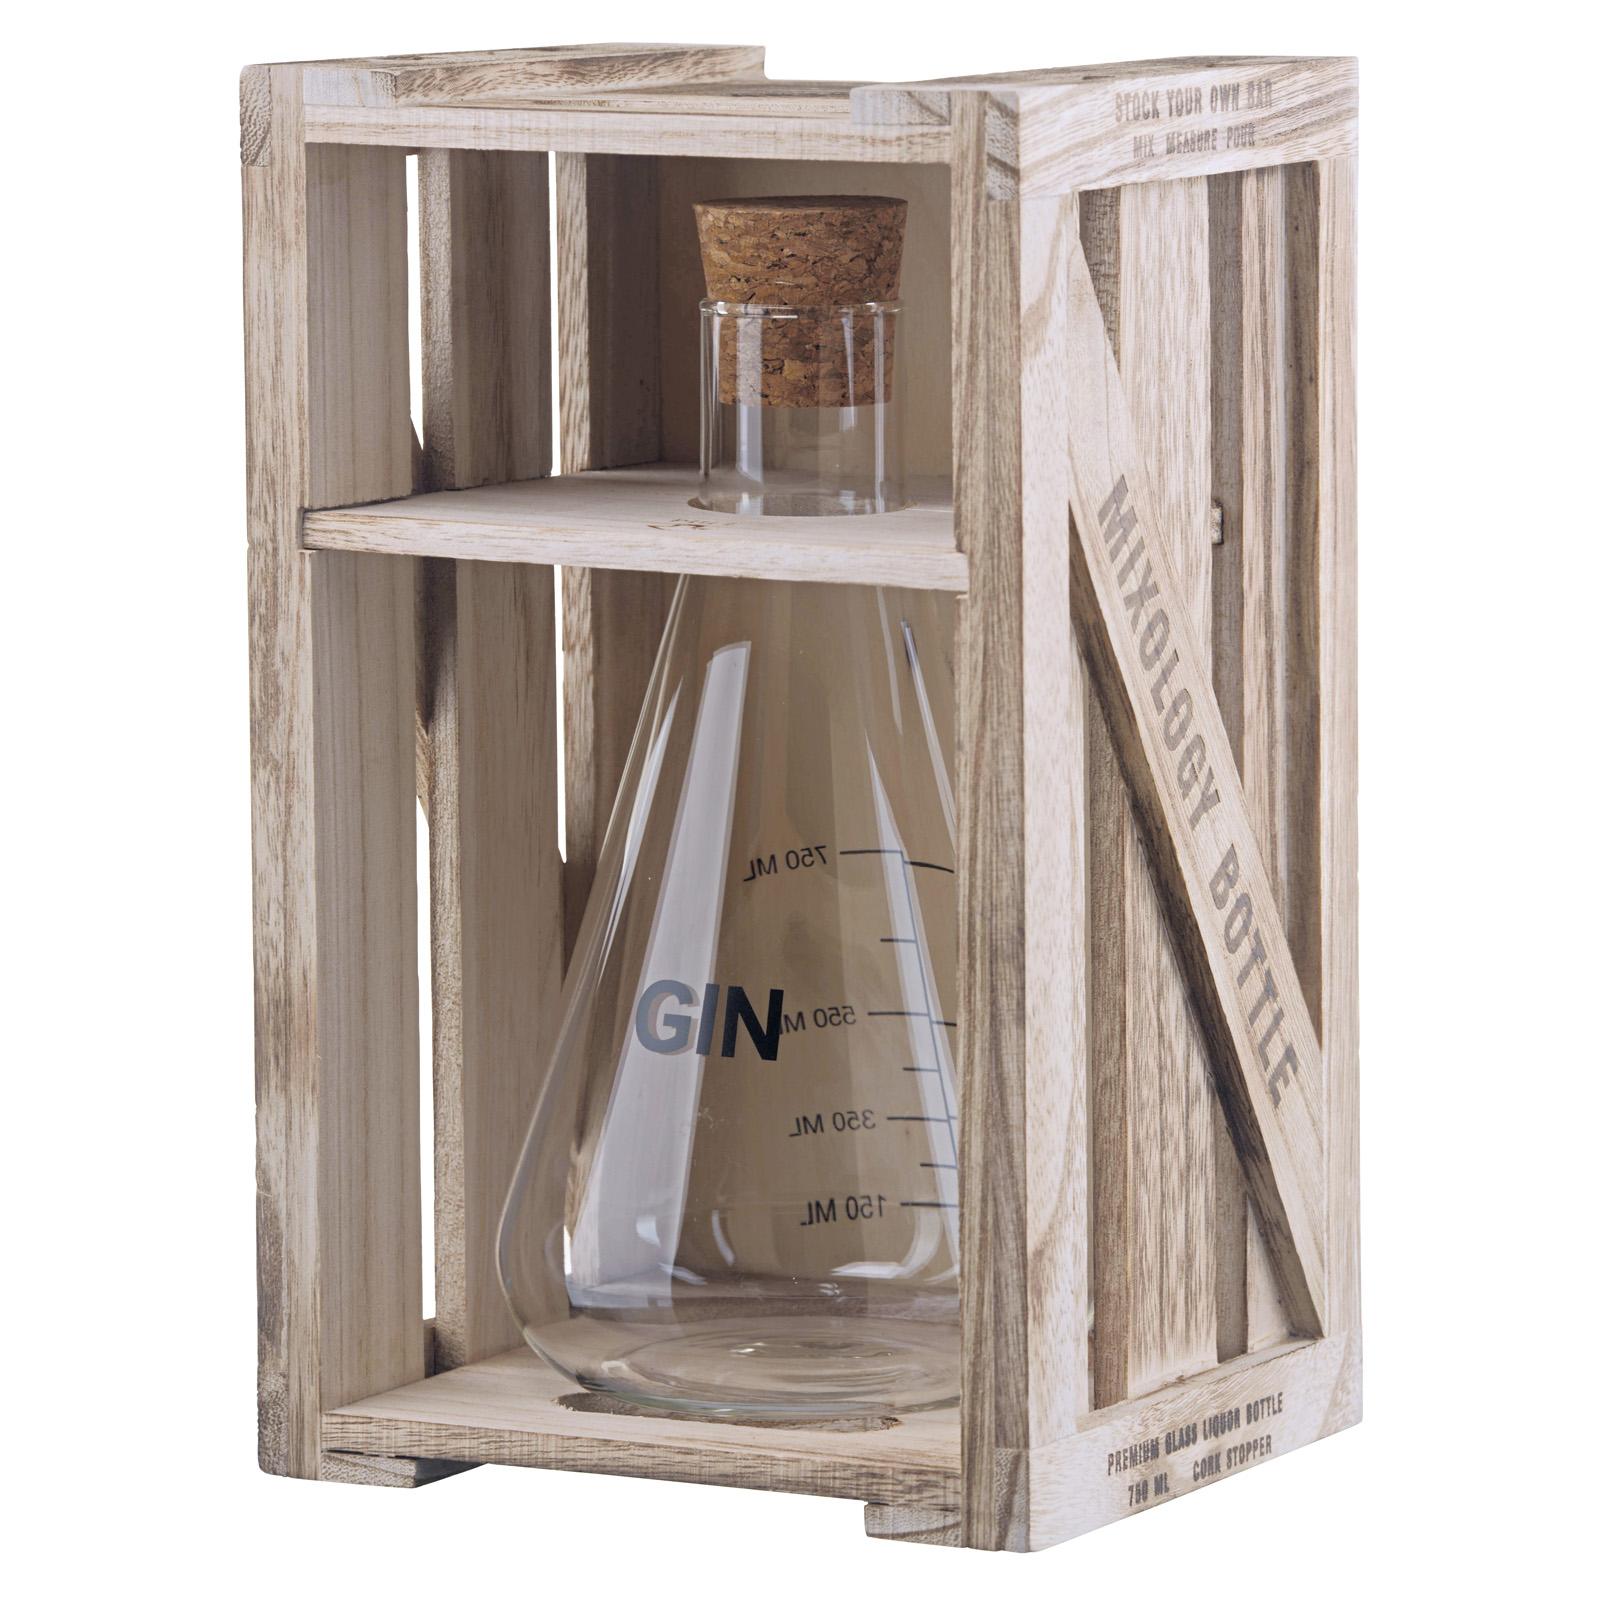 Mixology Gin Decanter by Artland